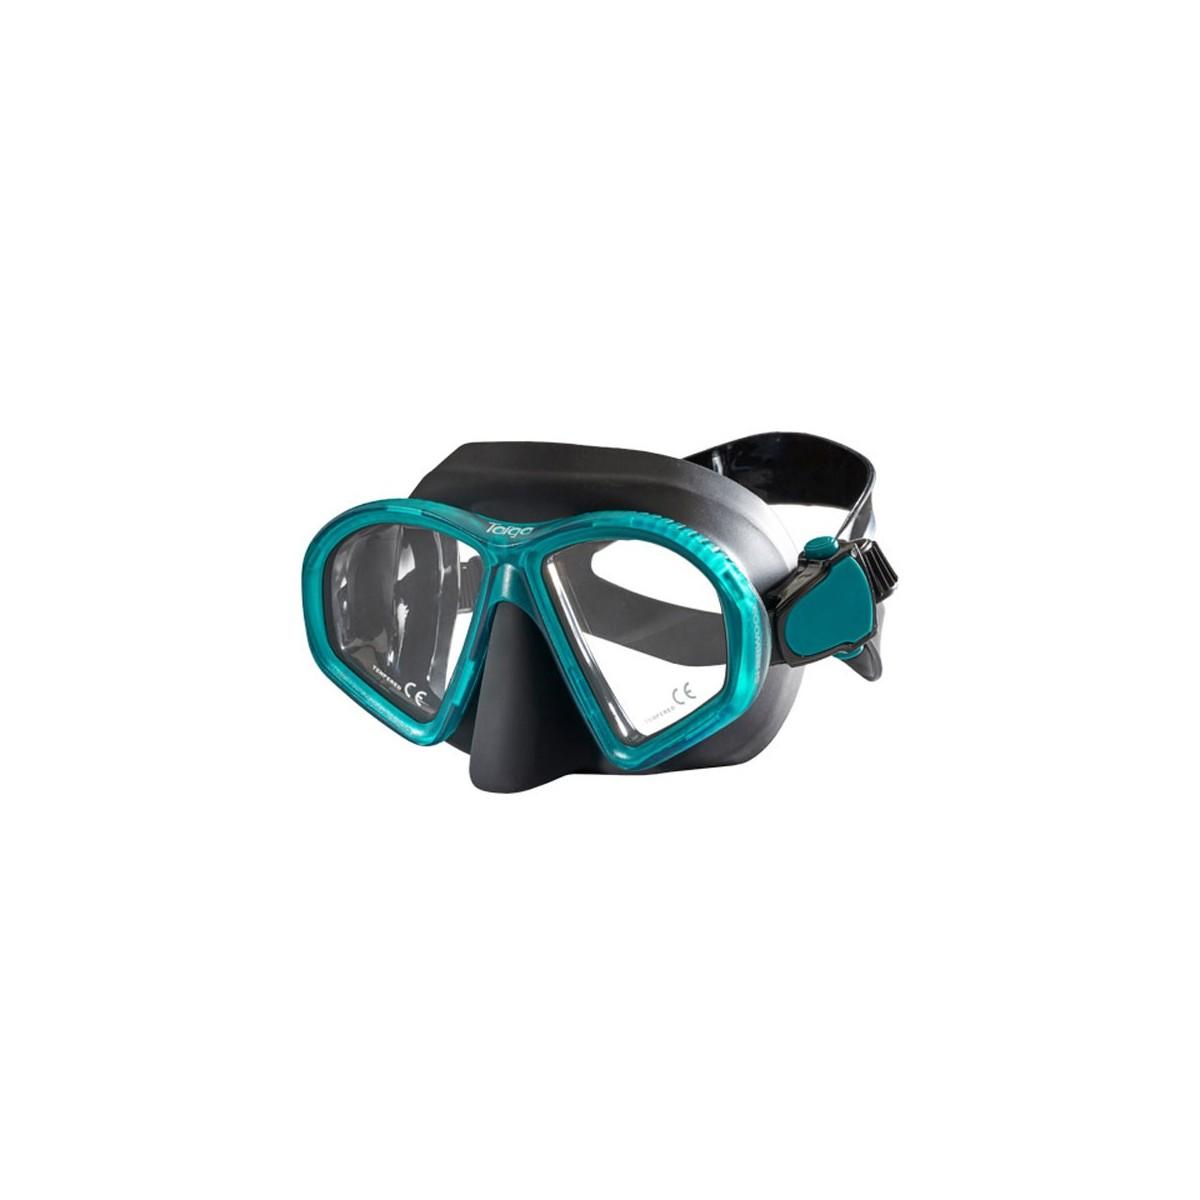 Sherwood Targa Mask Ma62 Islanddiverscom